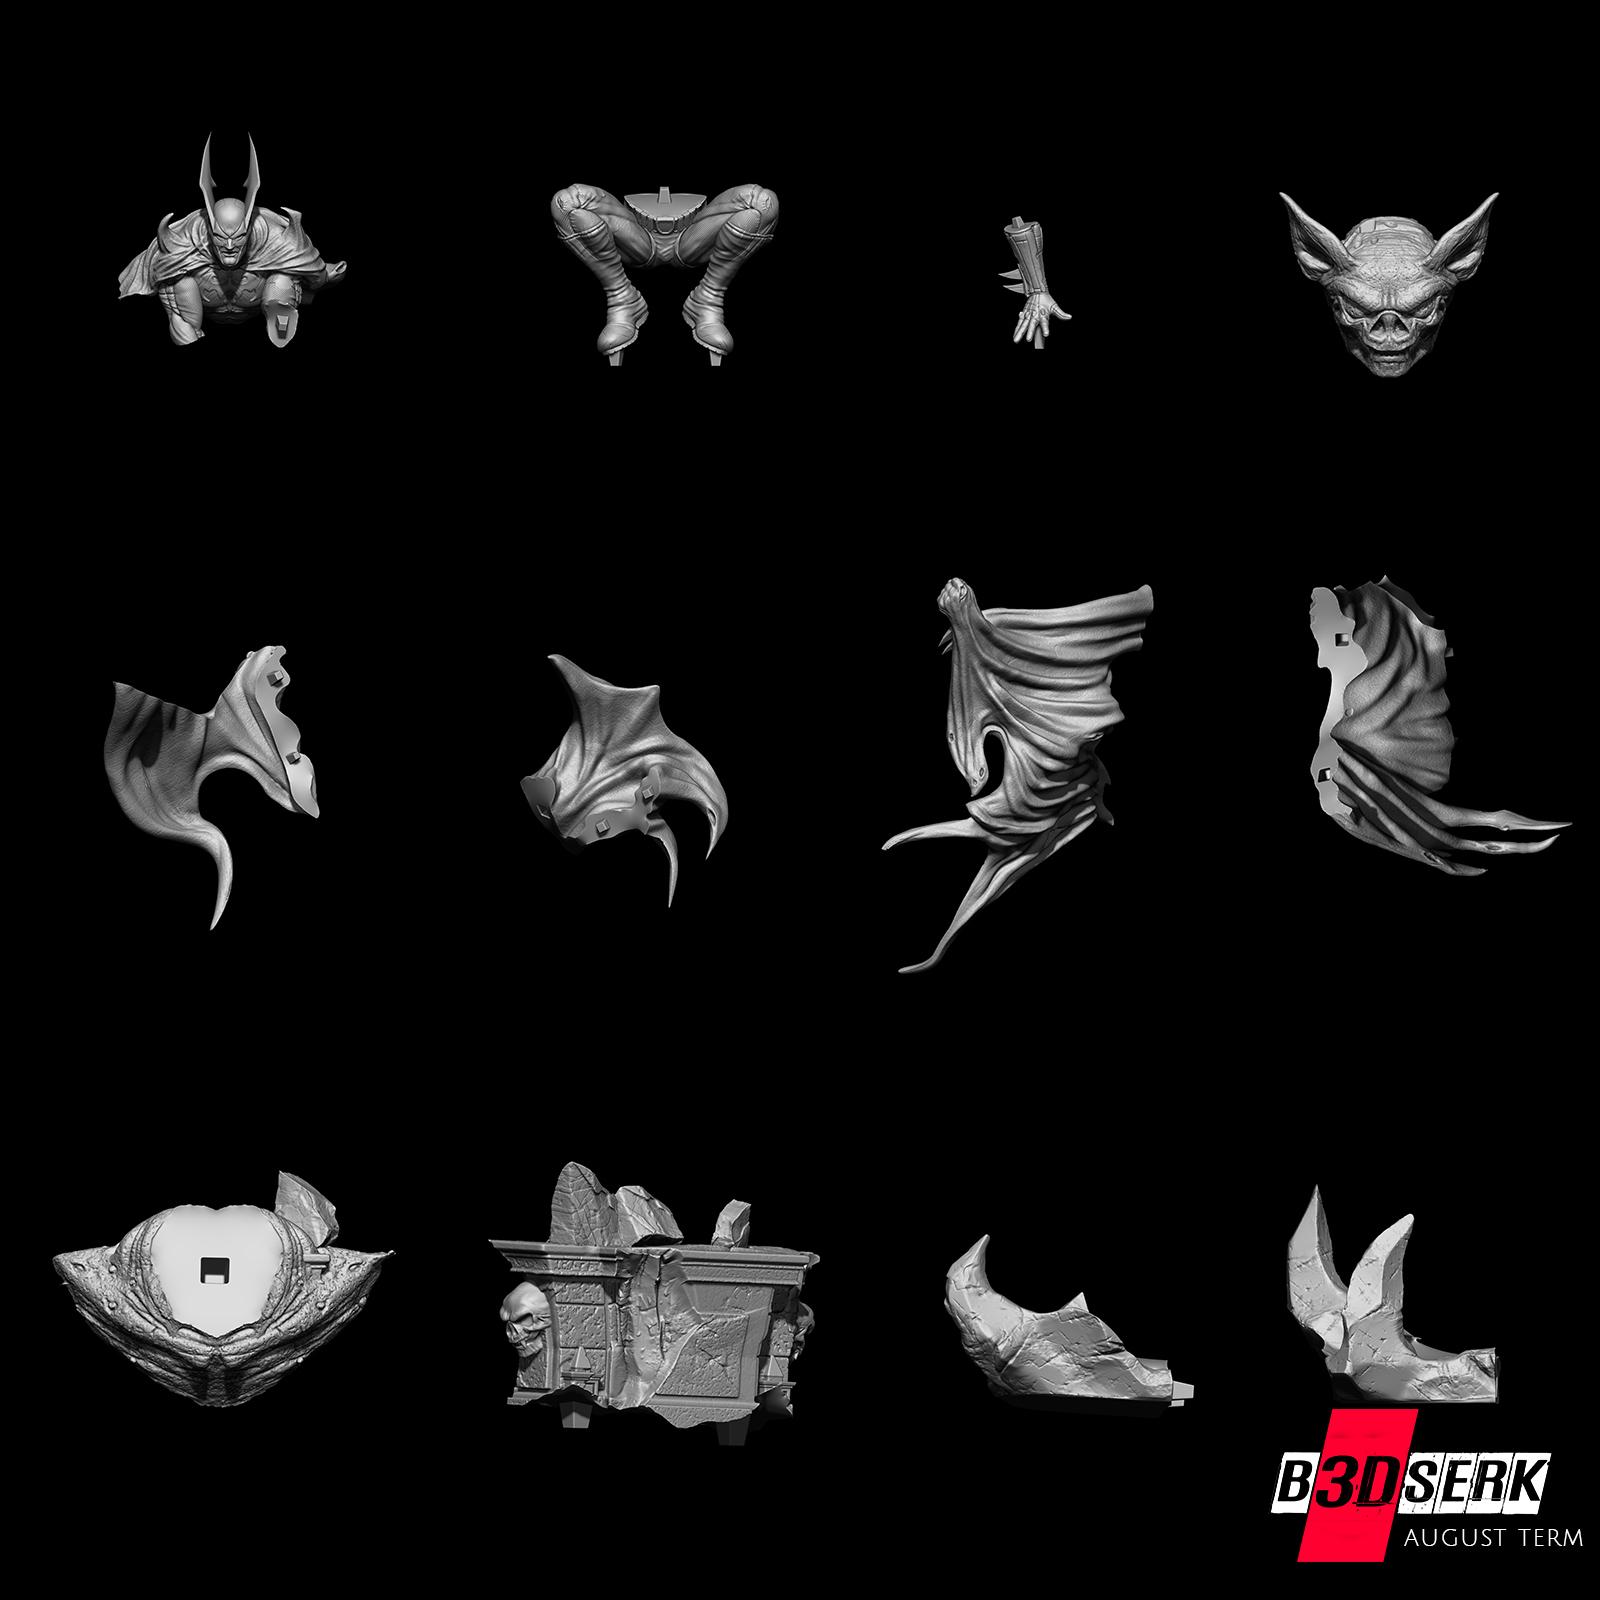 200820 B3DSERK - Batman promo 014.jpg Download free STL file Batman 3d sculpture tested and ready for printing by B3DSERK Studios • 3D printer object, b3dserk